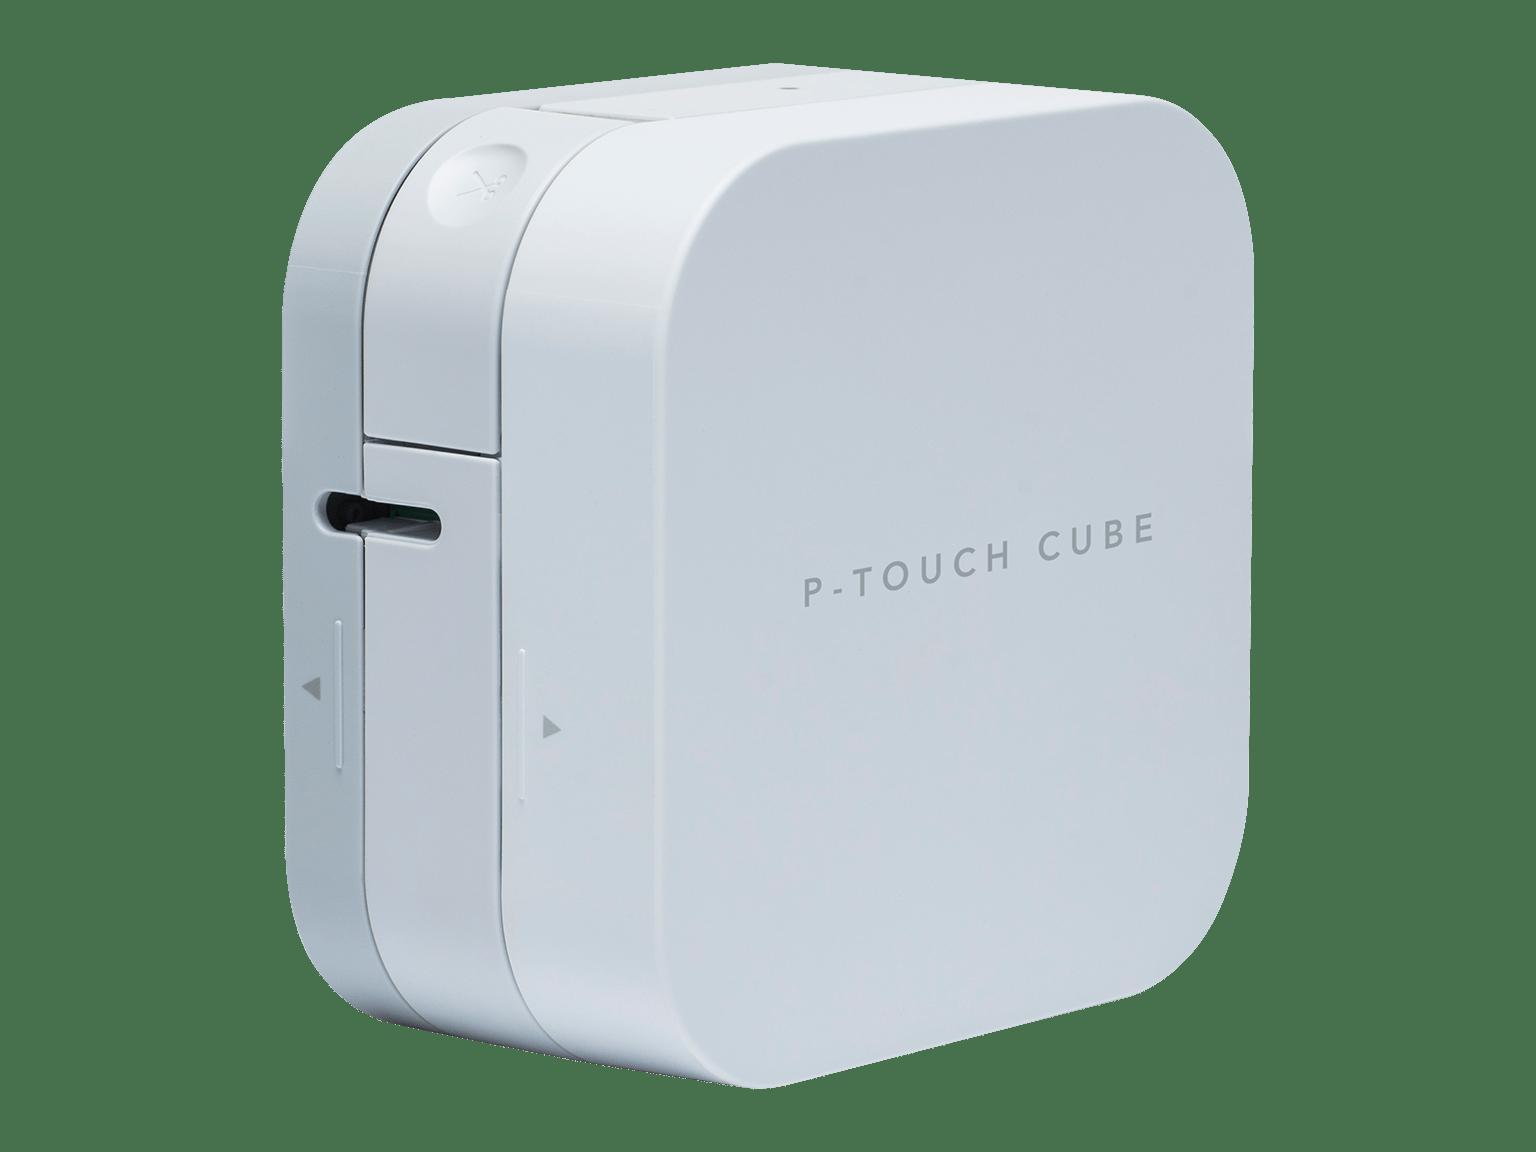 Brother P-touch CUBE P300BT címkenyomtató